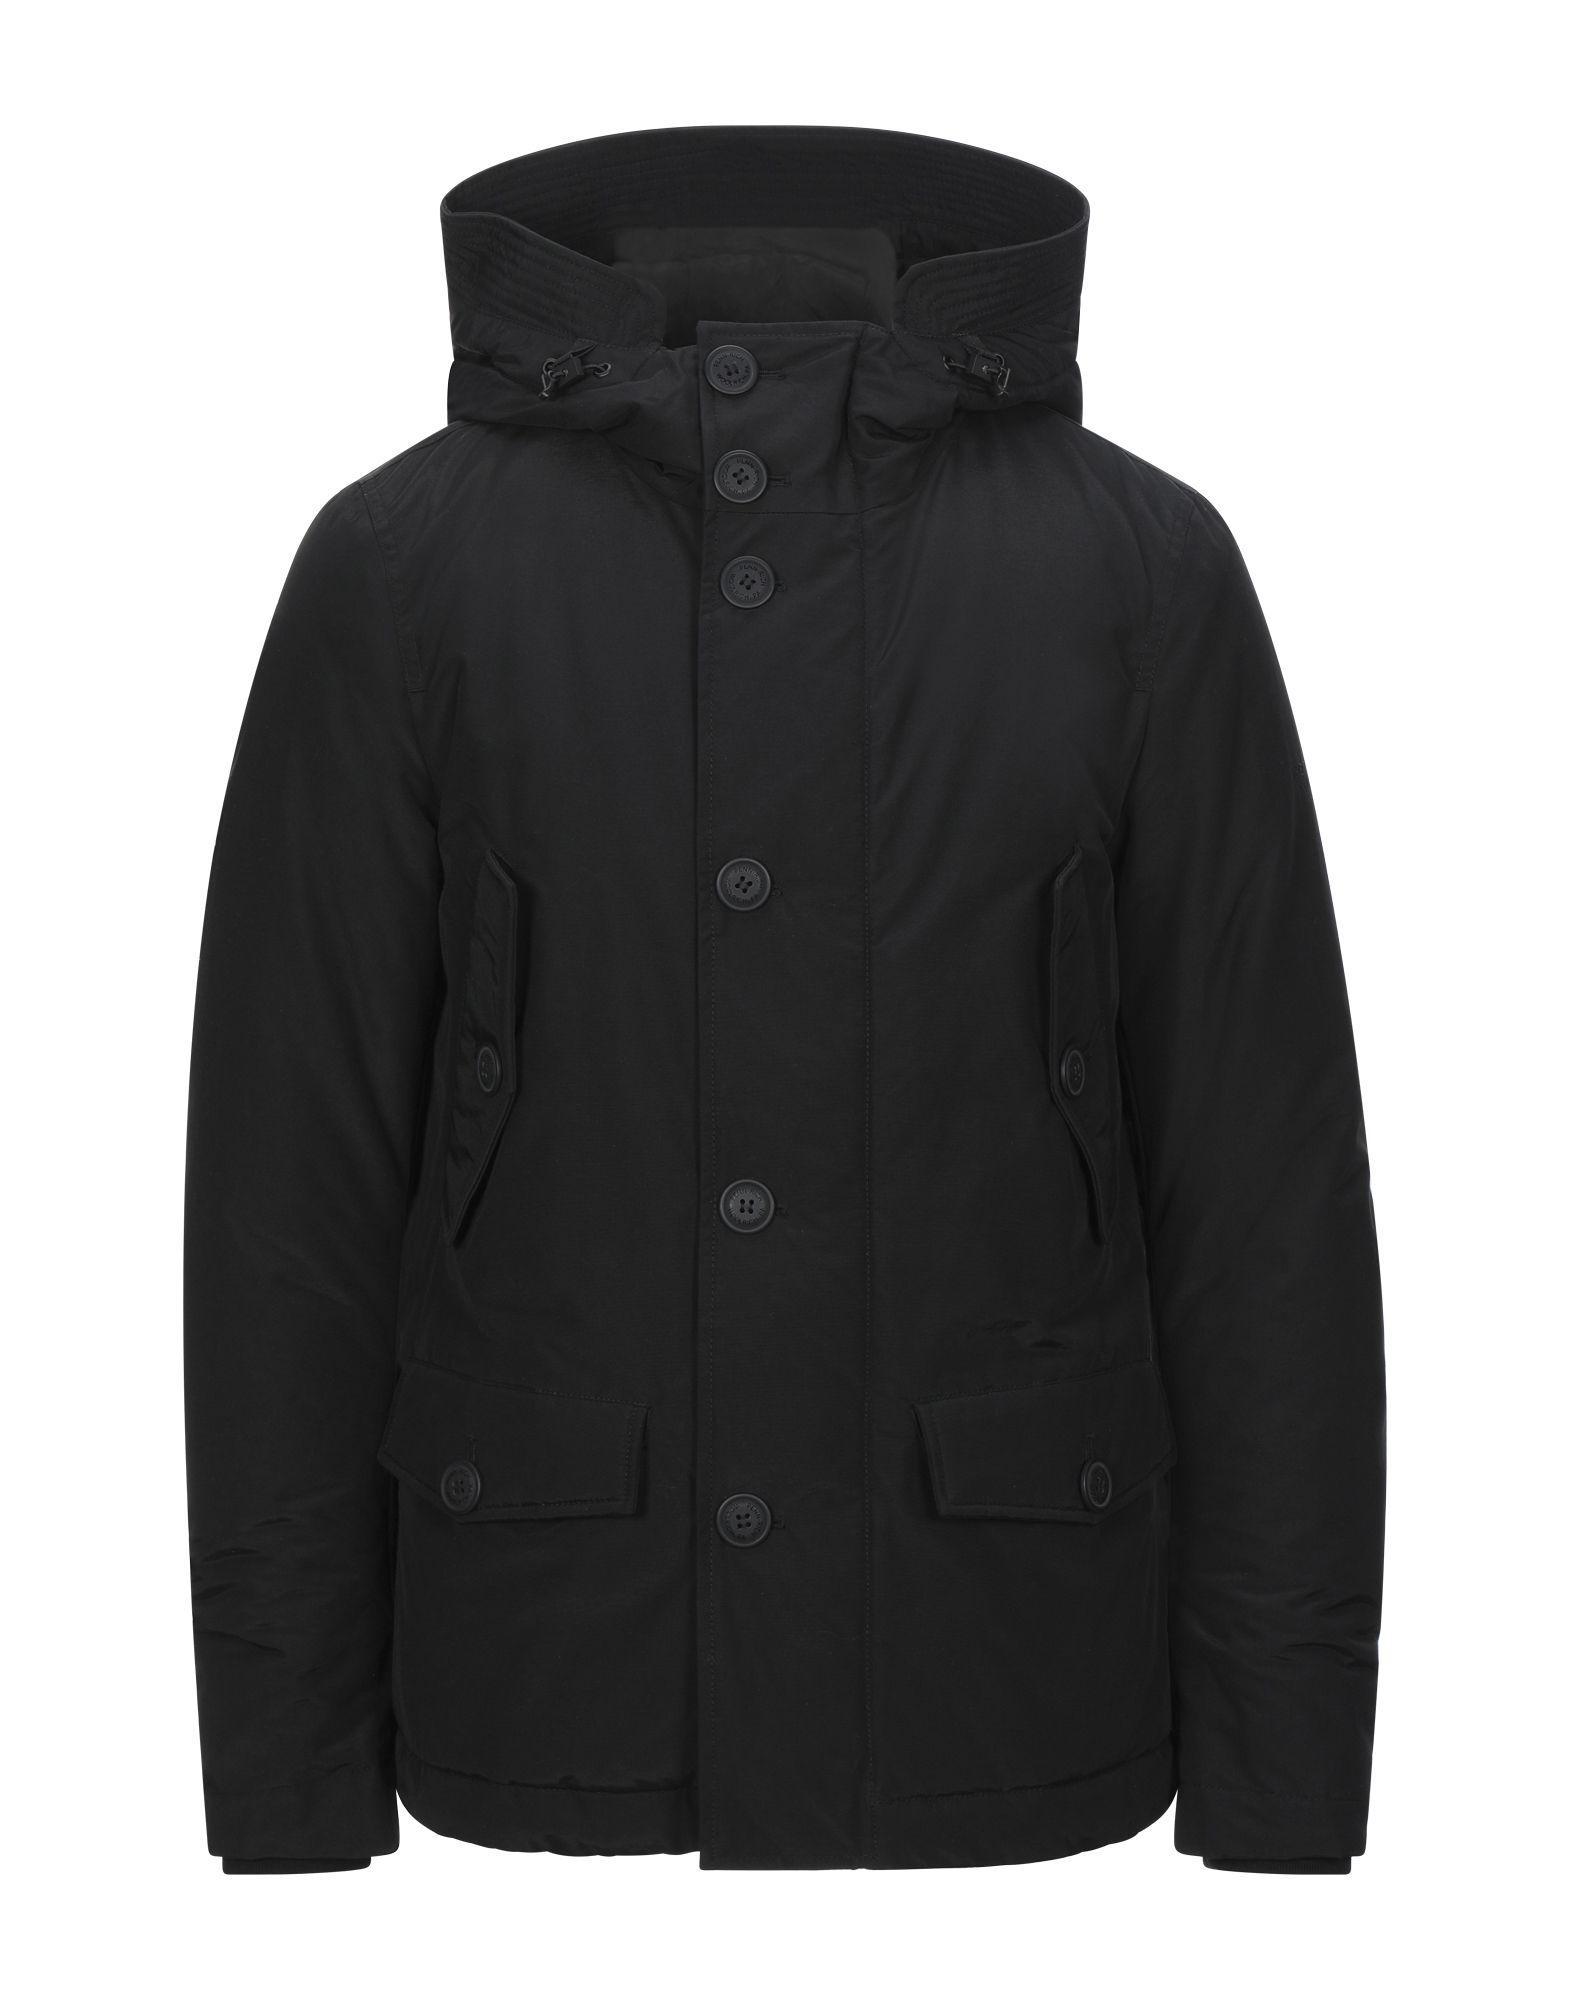 Фото - PENN-RICH WOOLRICH (PA) Куртка куртка woolrich куртка